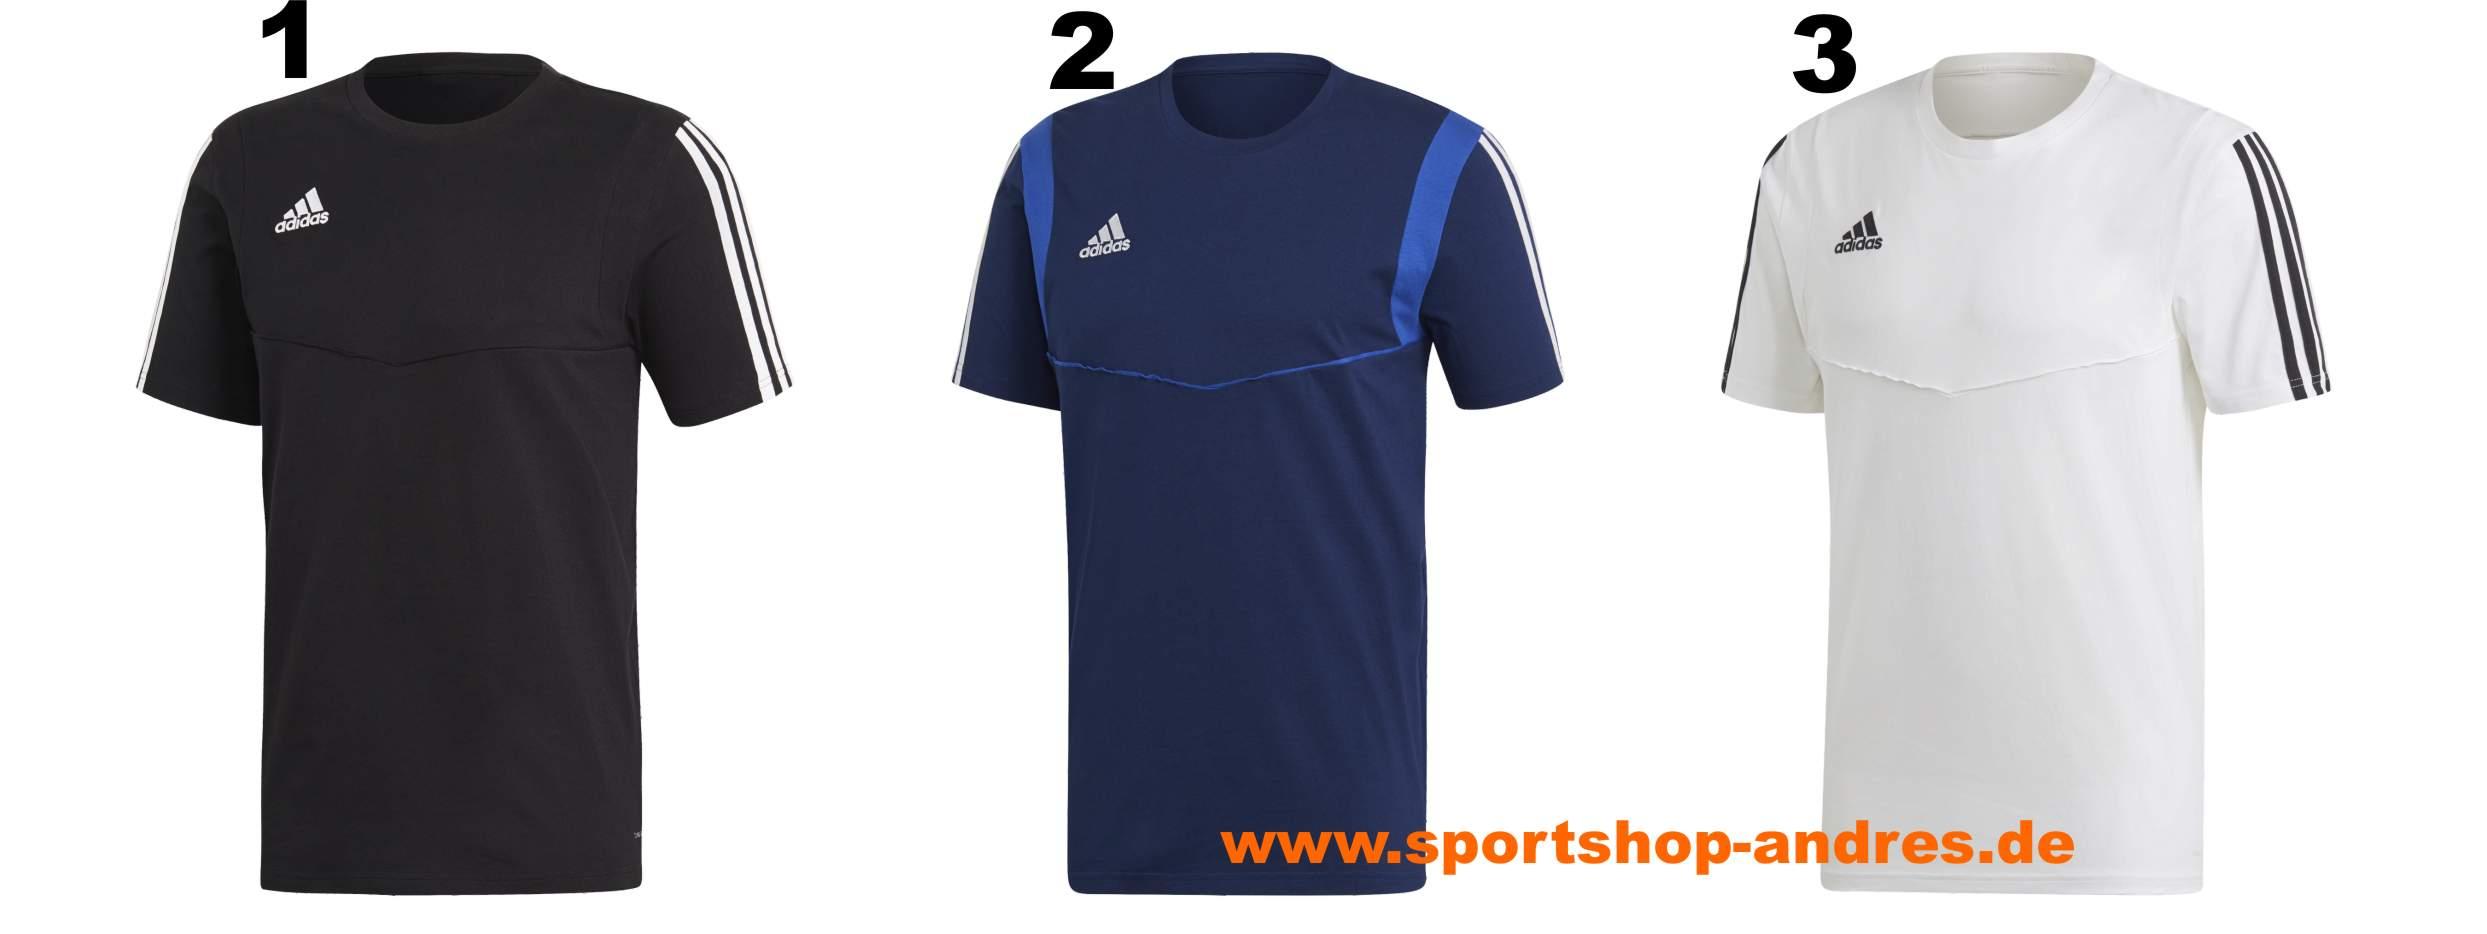 T shirt adidas Tiro 19 Tee Dt5792 XXL schwarz